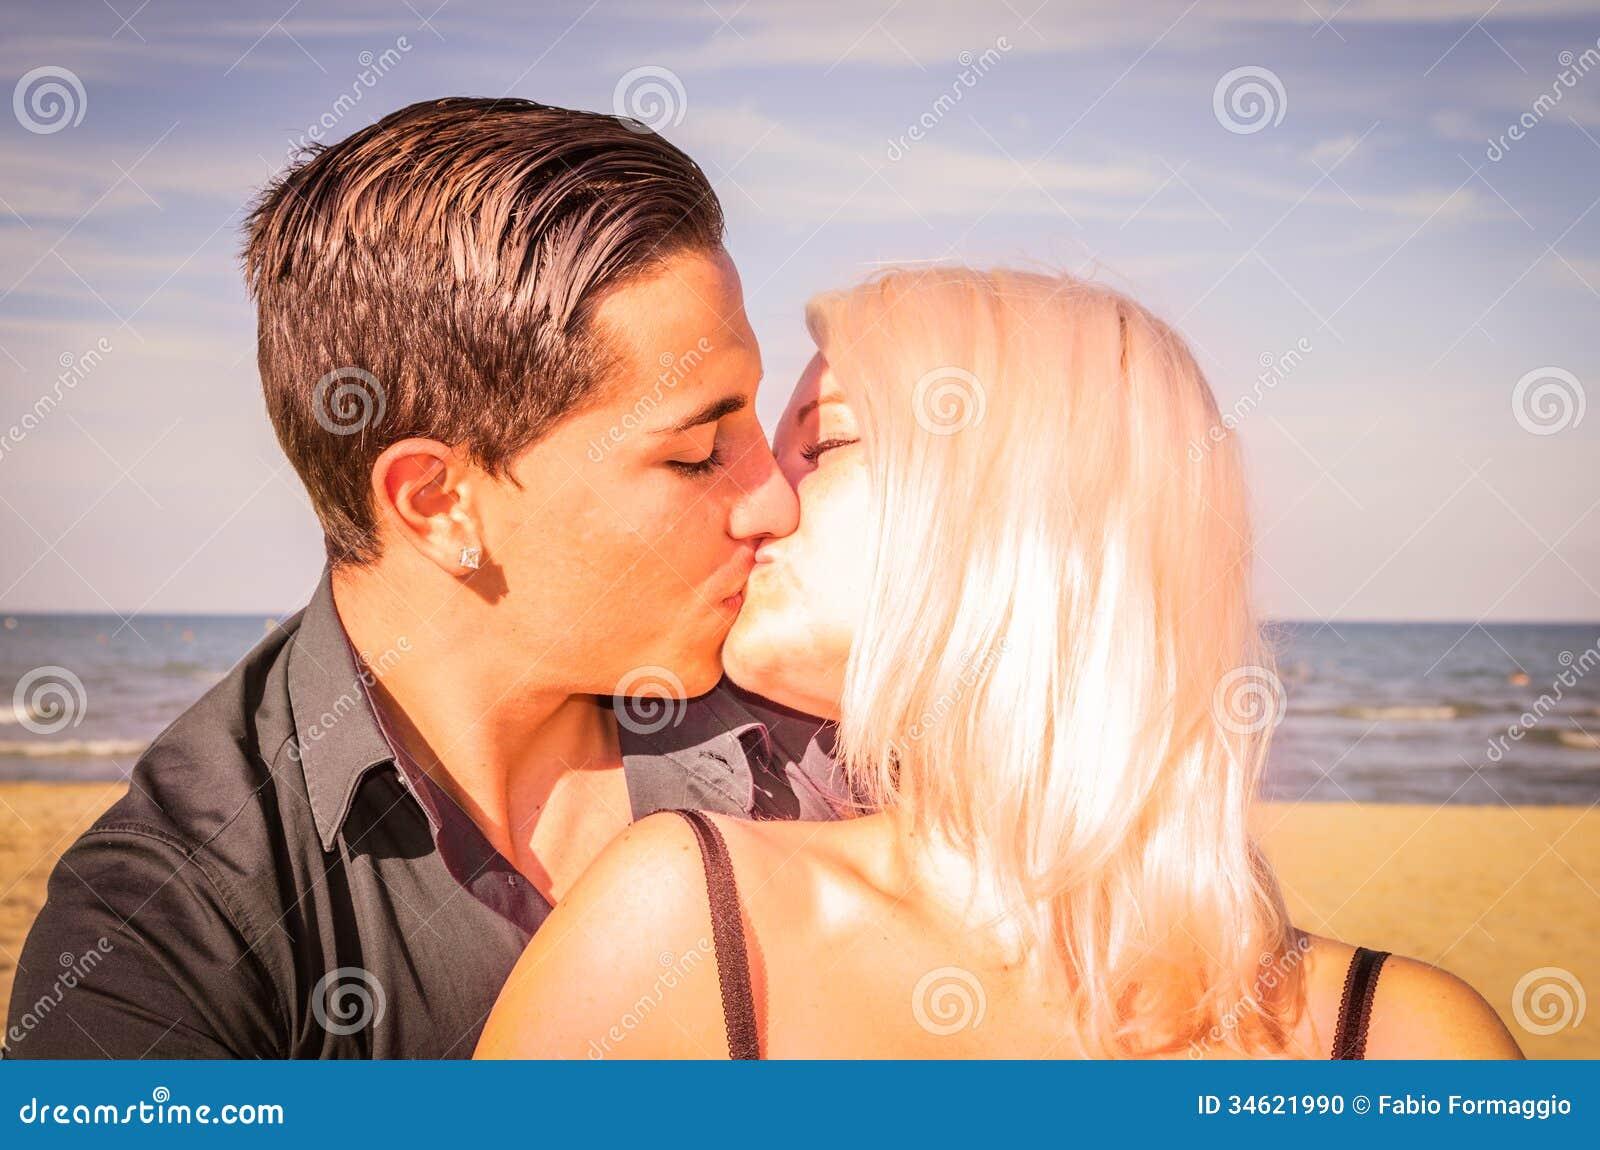 online dating sites ecuador